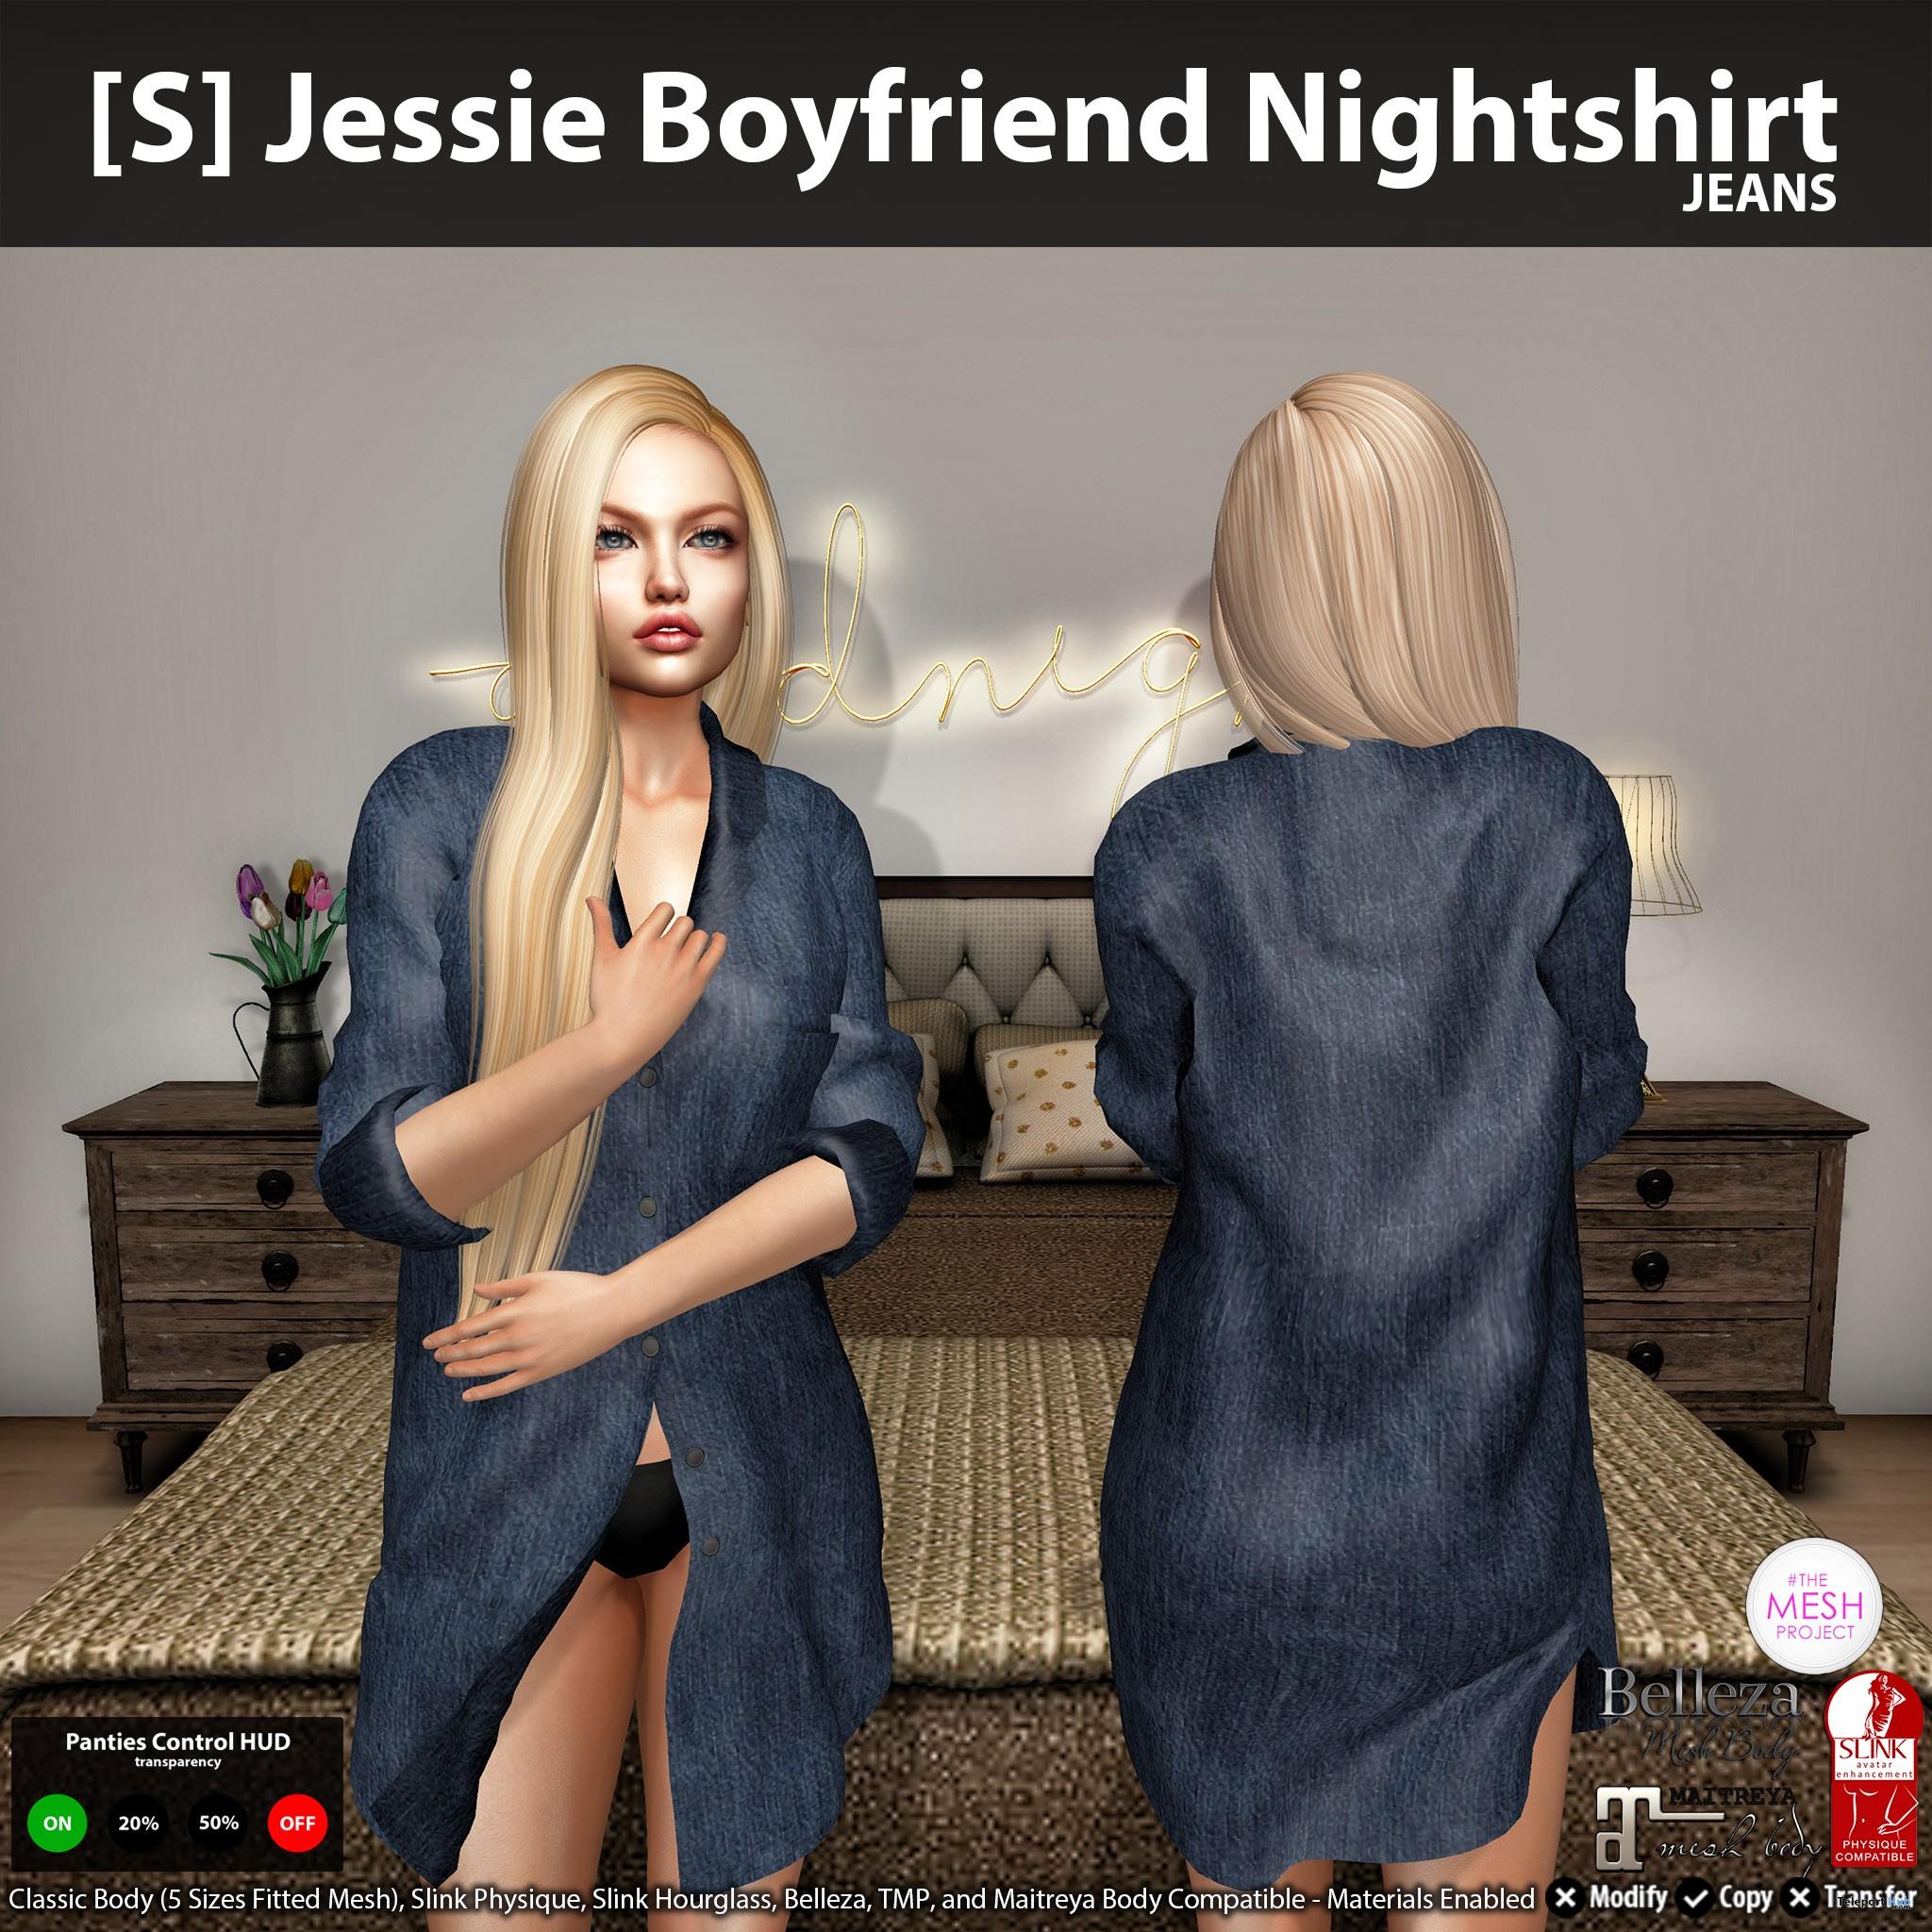 New Release: [S] Jessie Boyfriend Nightshirt by [satus Inc] - Teleport Hub - teleporthub.com